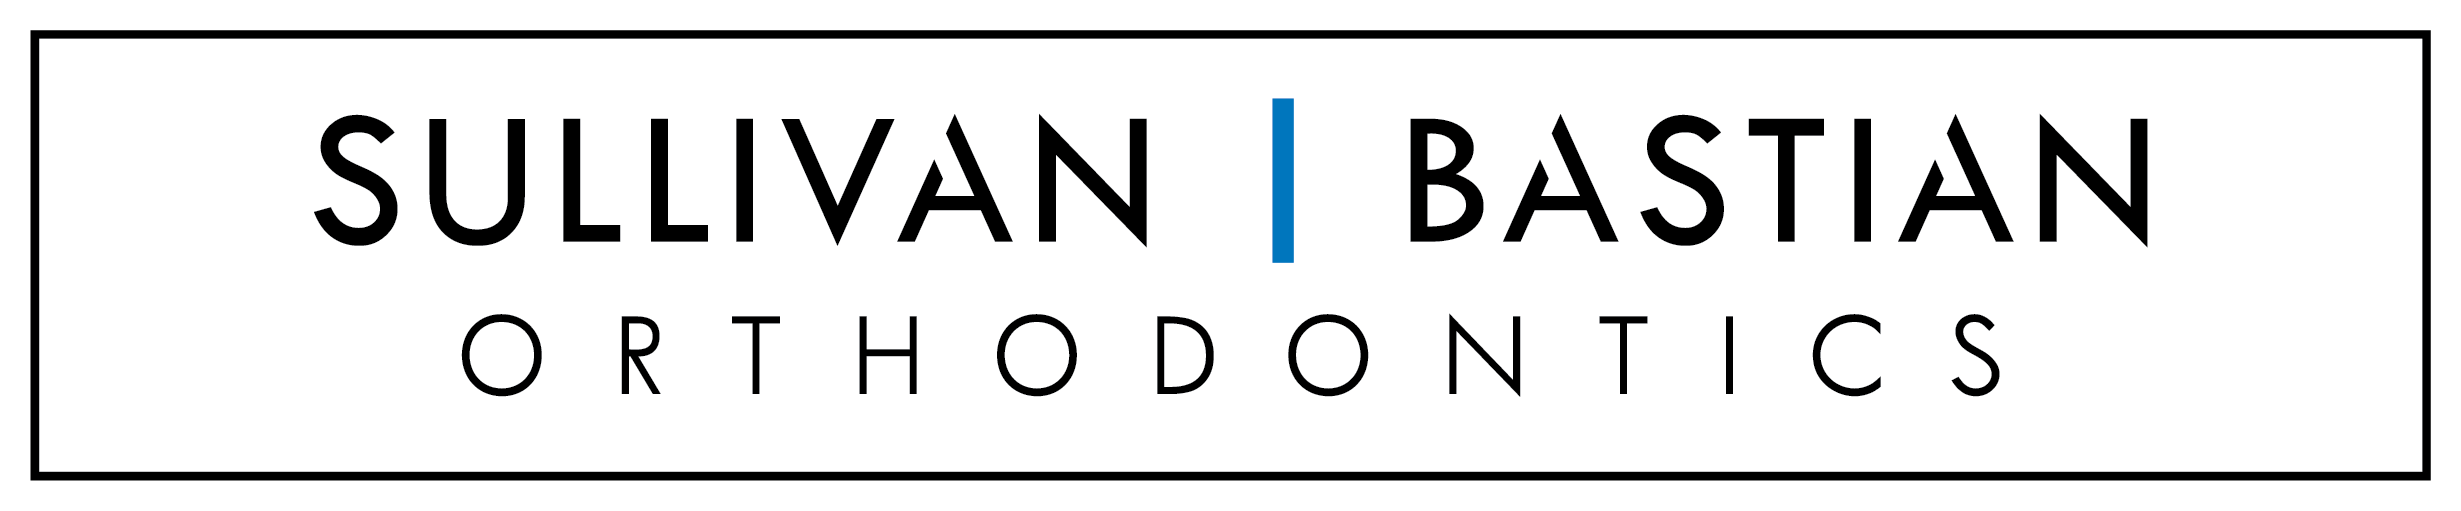 sullivan-bastian-orthodontics-1_7742a80189e6a7316e6d7a34f0b47a89